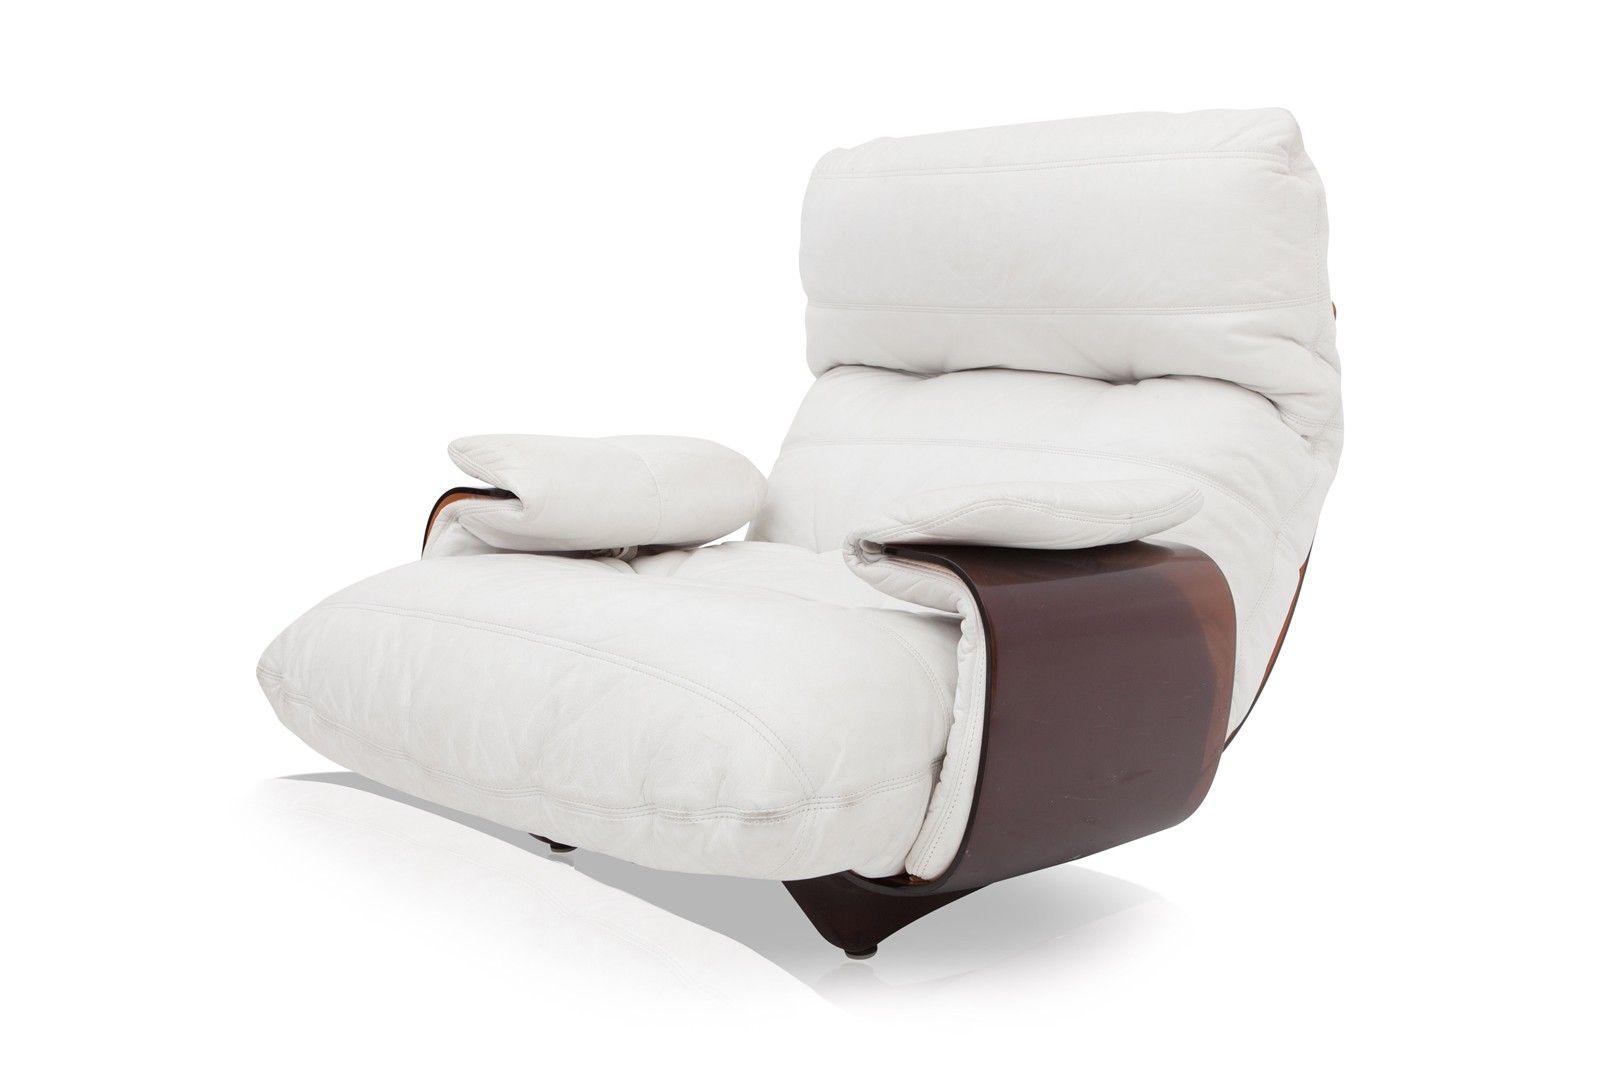 Michel Ducaroy Marsala Lounge Chair For Roset-goldwood-by-boris ...